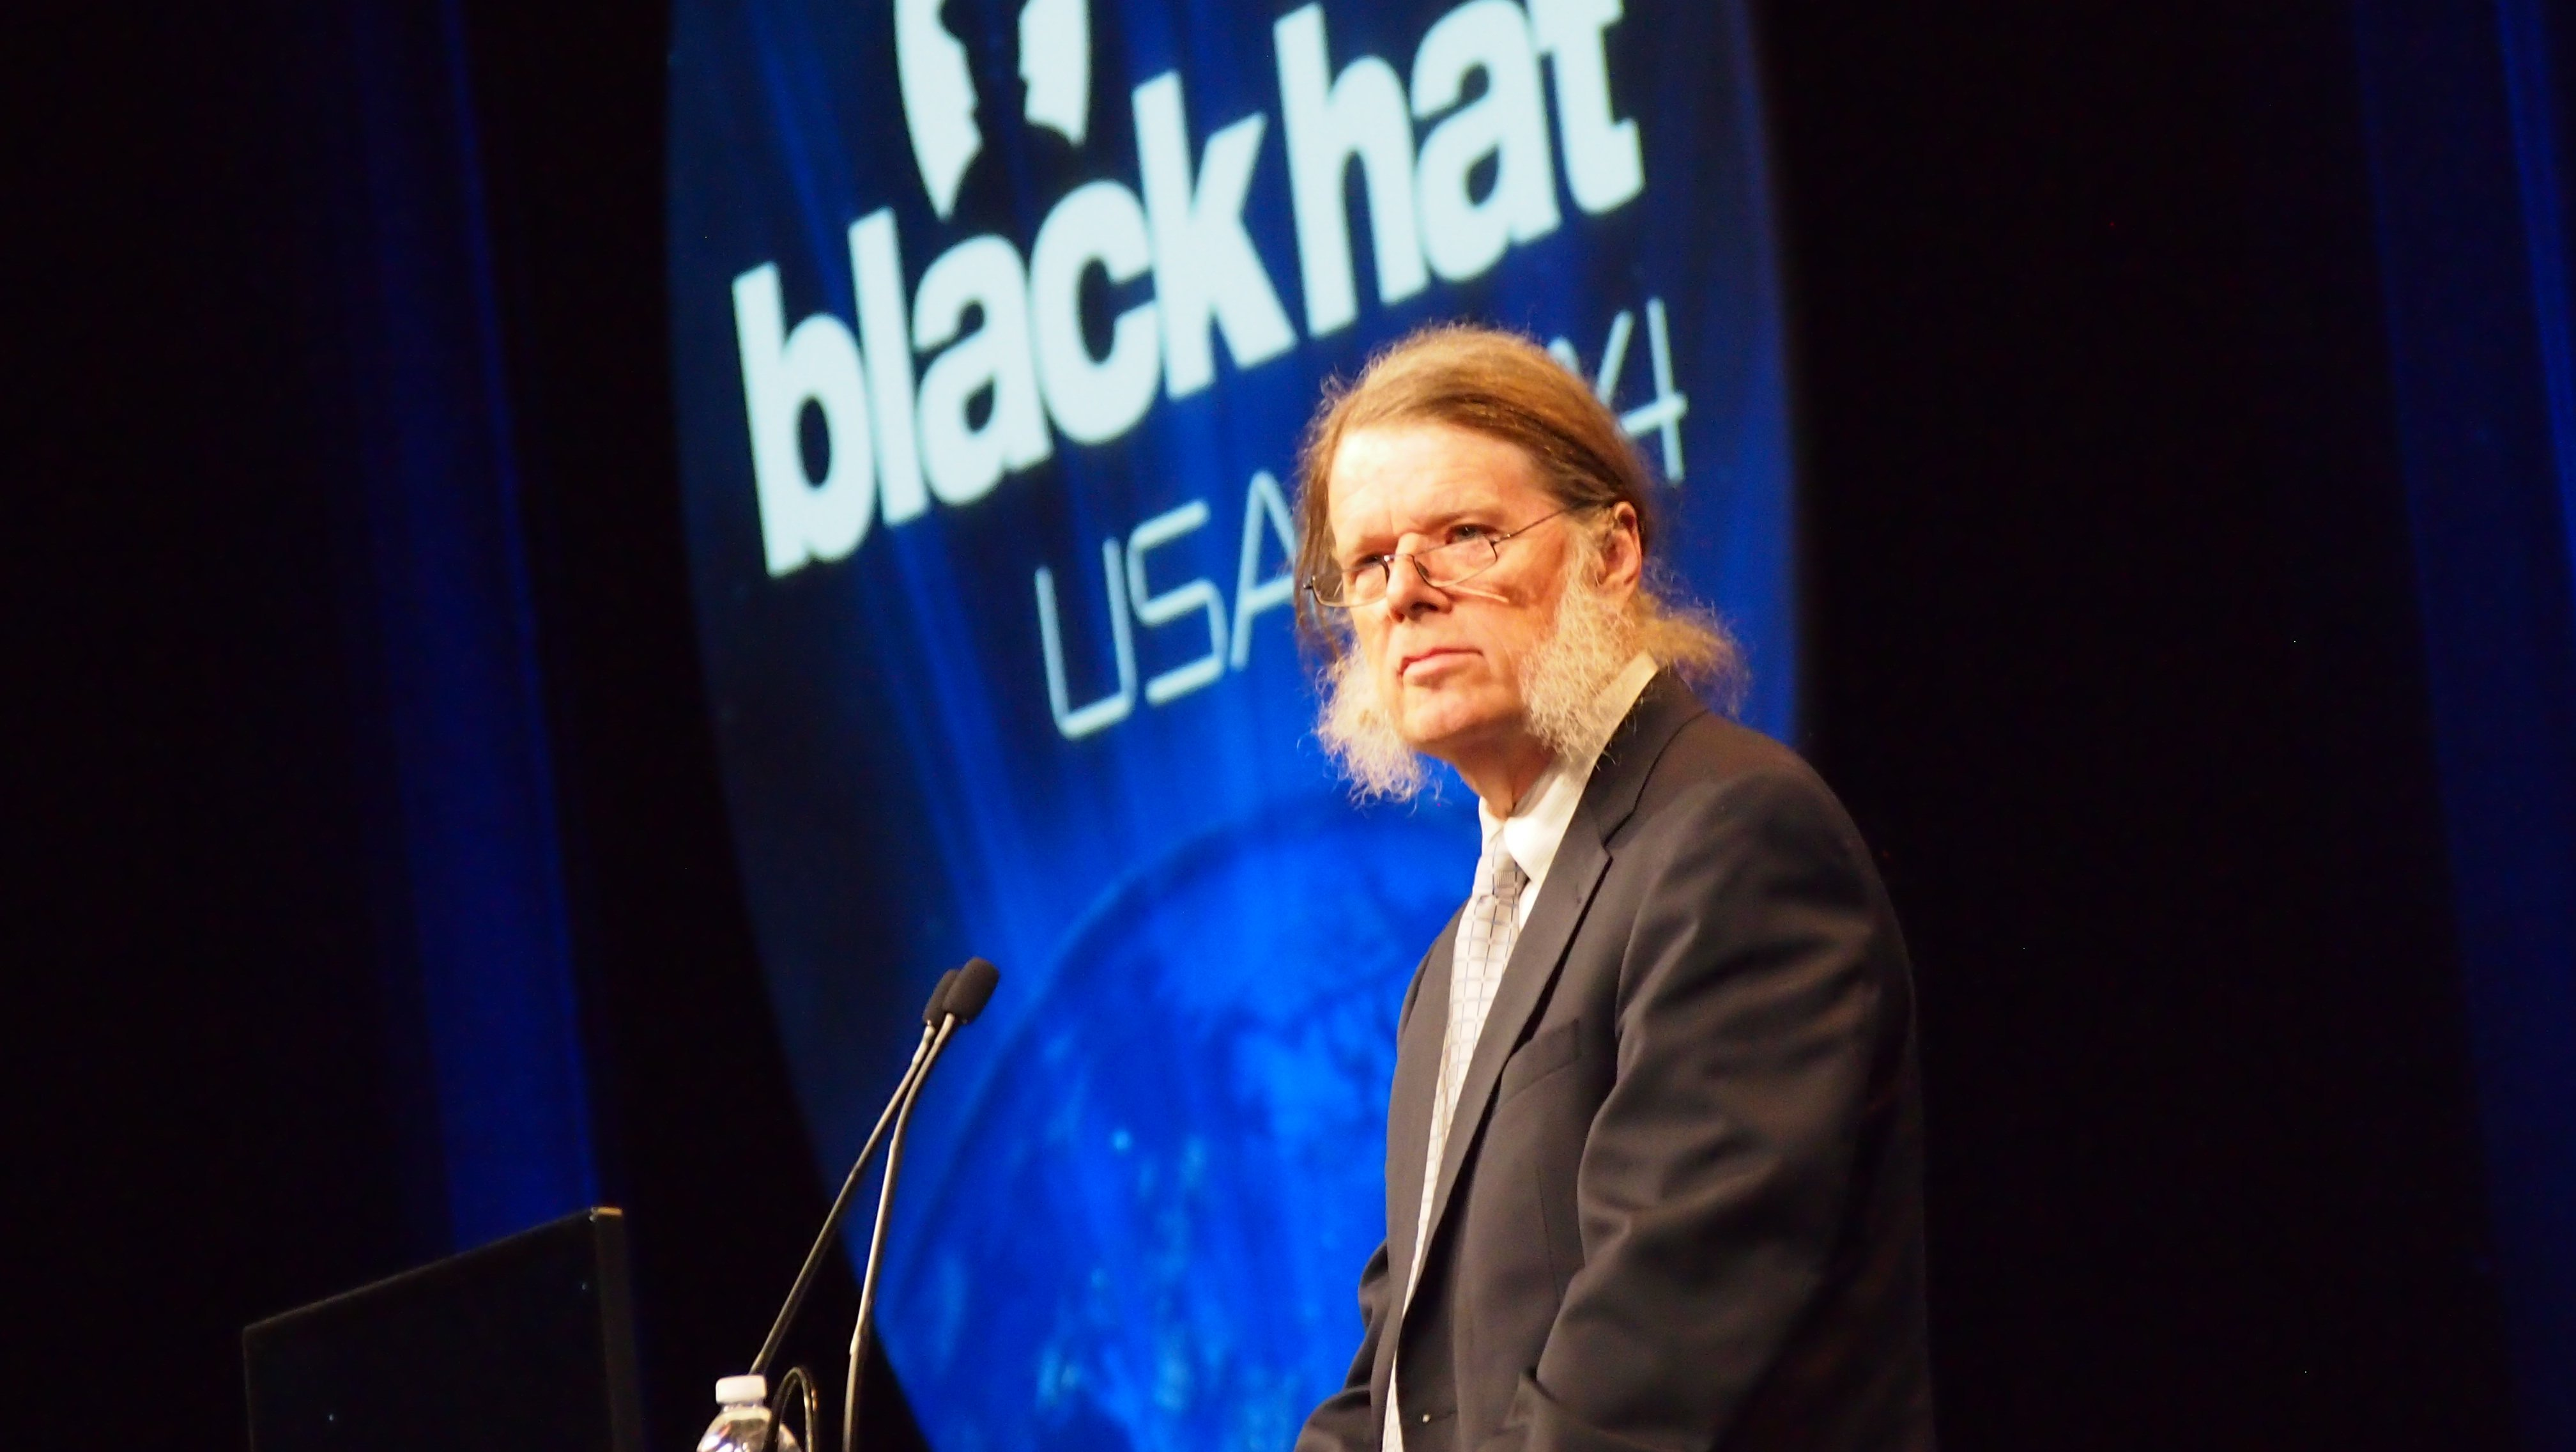 Security luminary Dan Geer keynotes Black Hat 2014.